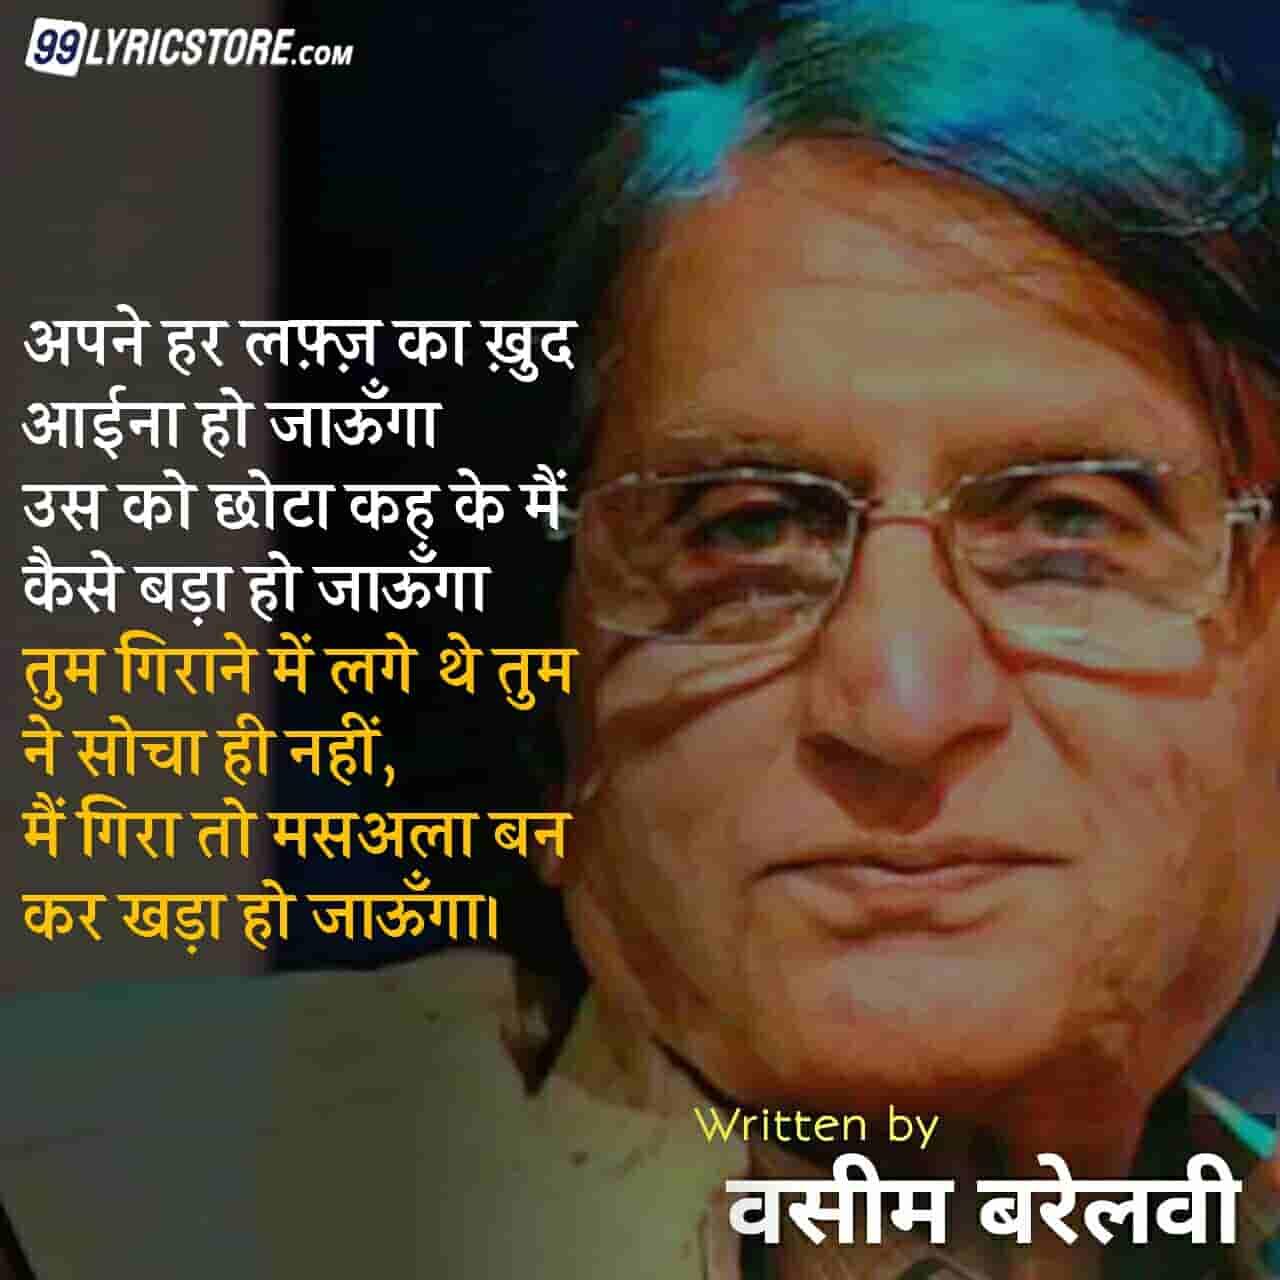 This beautiful Ghazal 'Apne Har Lafz Ka Khud Aaina Ho Jaaunga' has written by Waseem Barelvi.